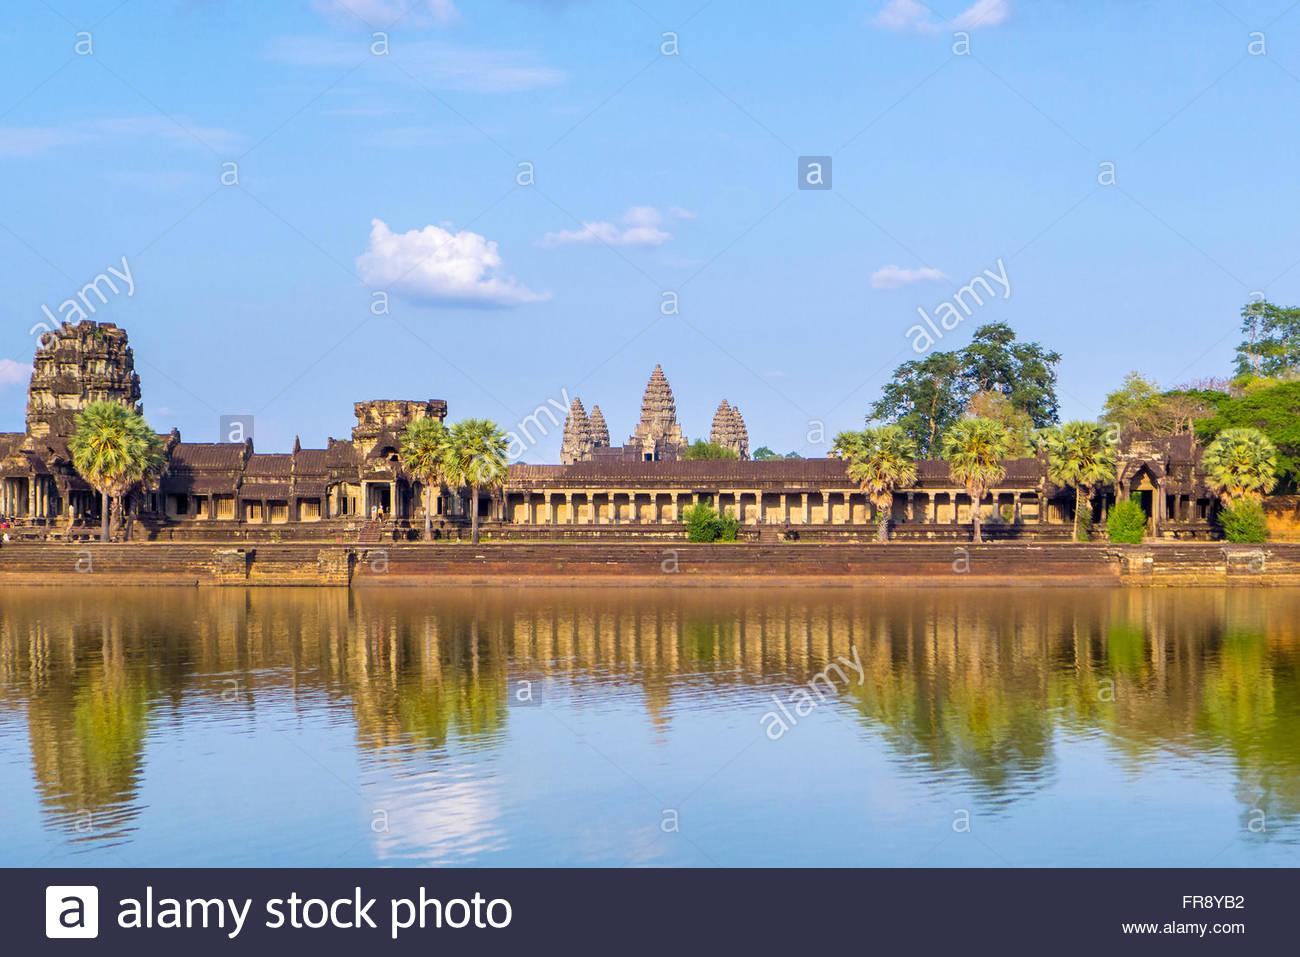 Angkor Wat, UNESCO World Heritage Site, Siem Reap Province, Cambodia Stock Photo